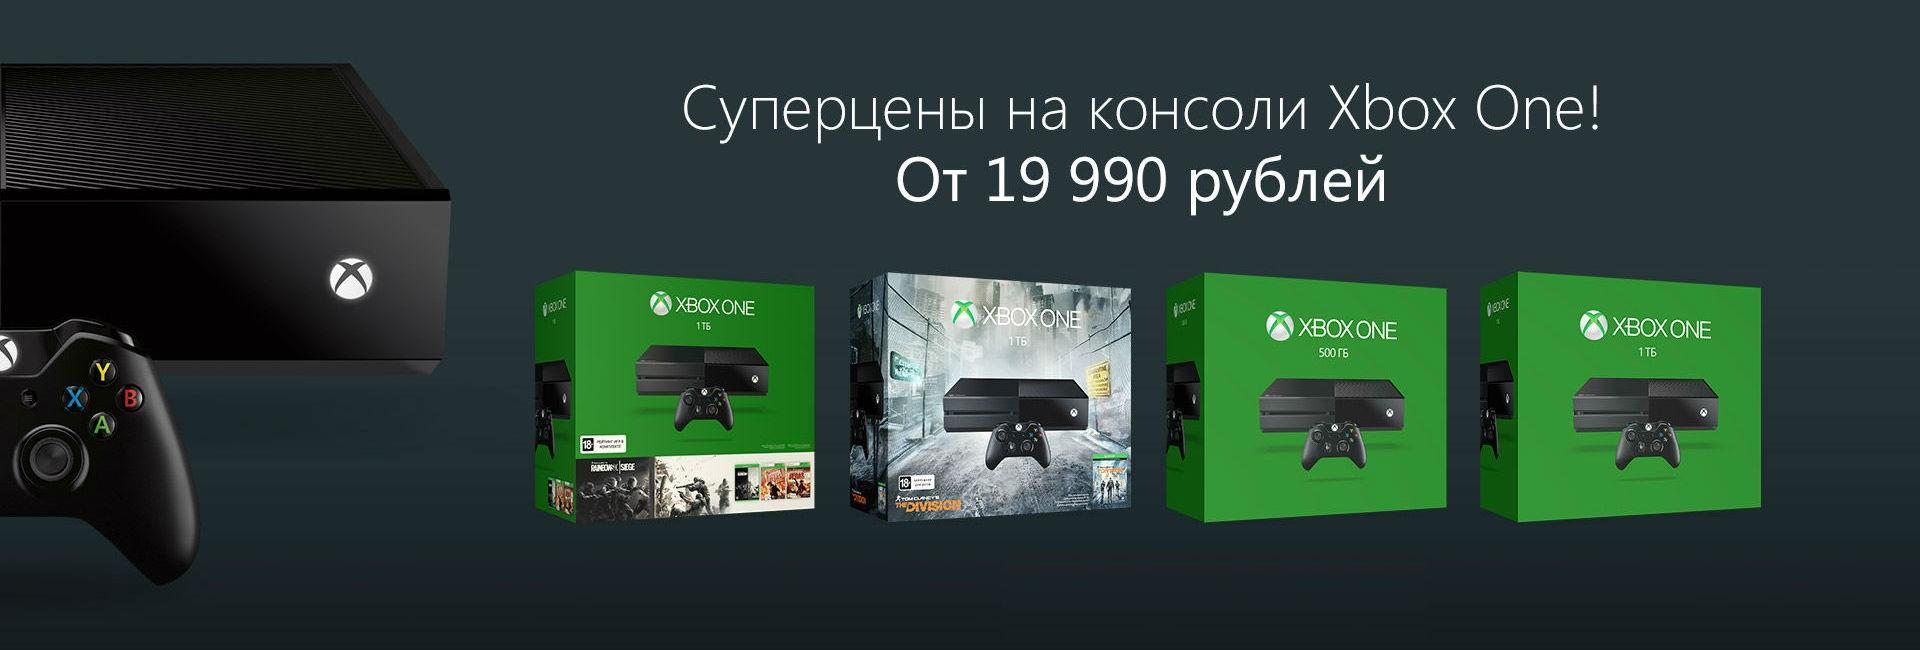 Xbox со скидкой на Microsoftstore.ru